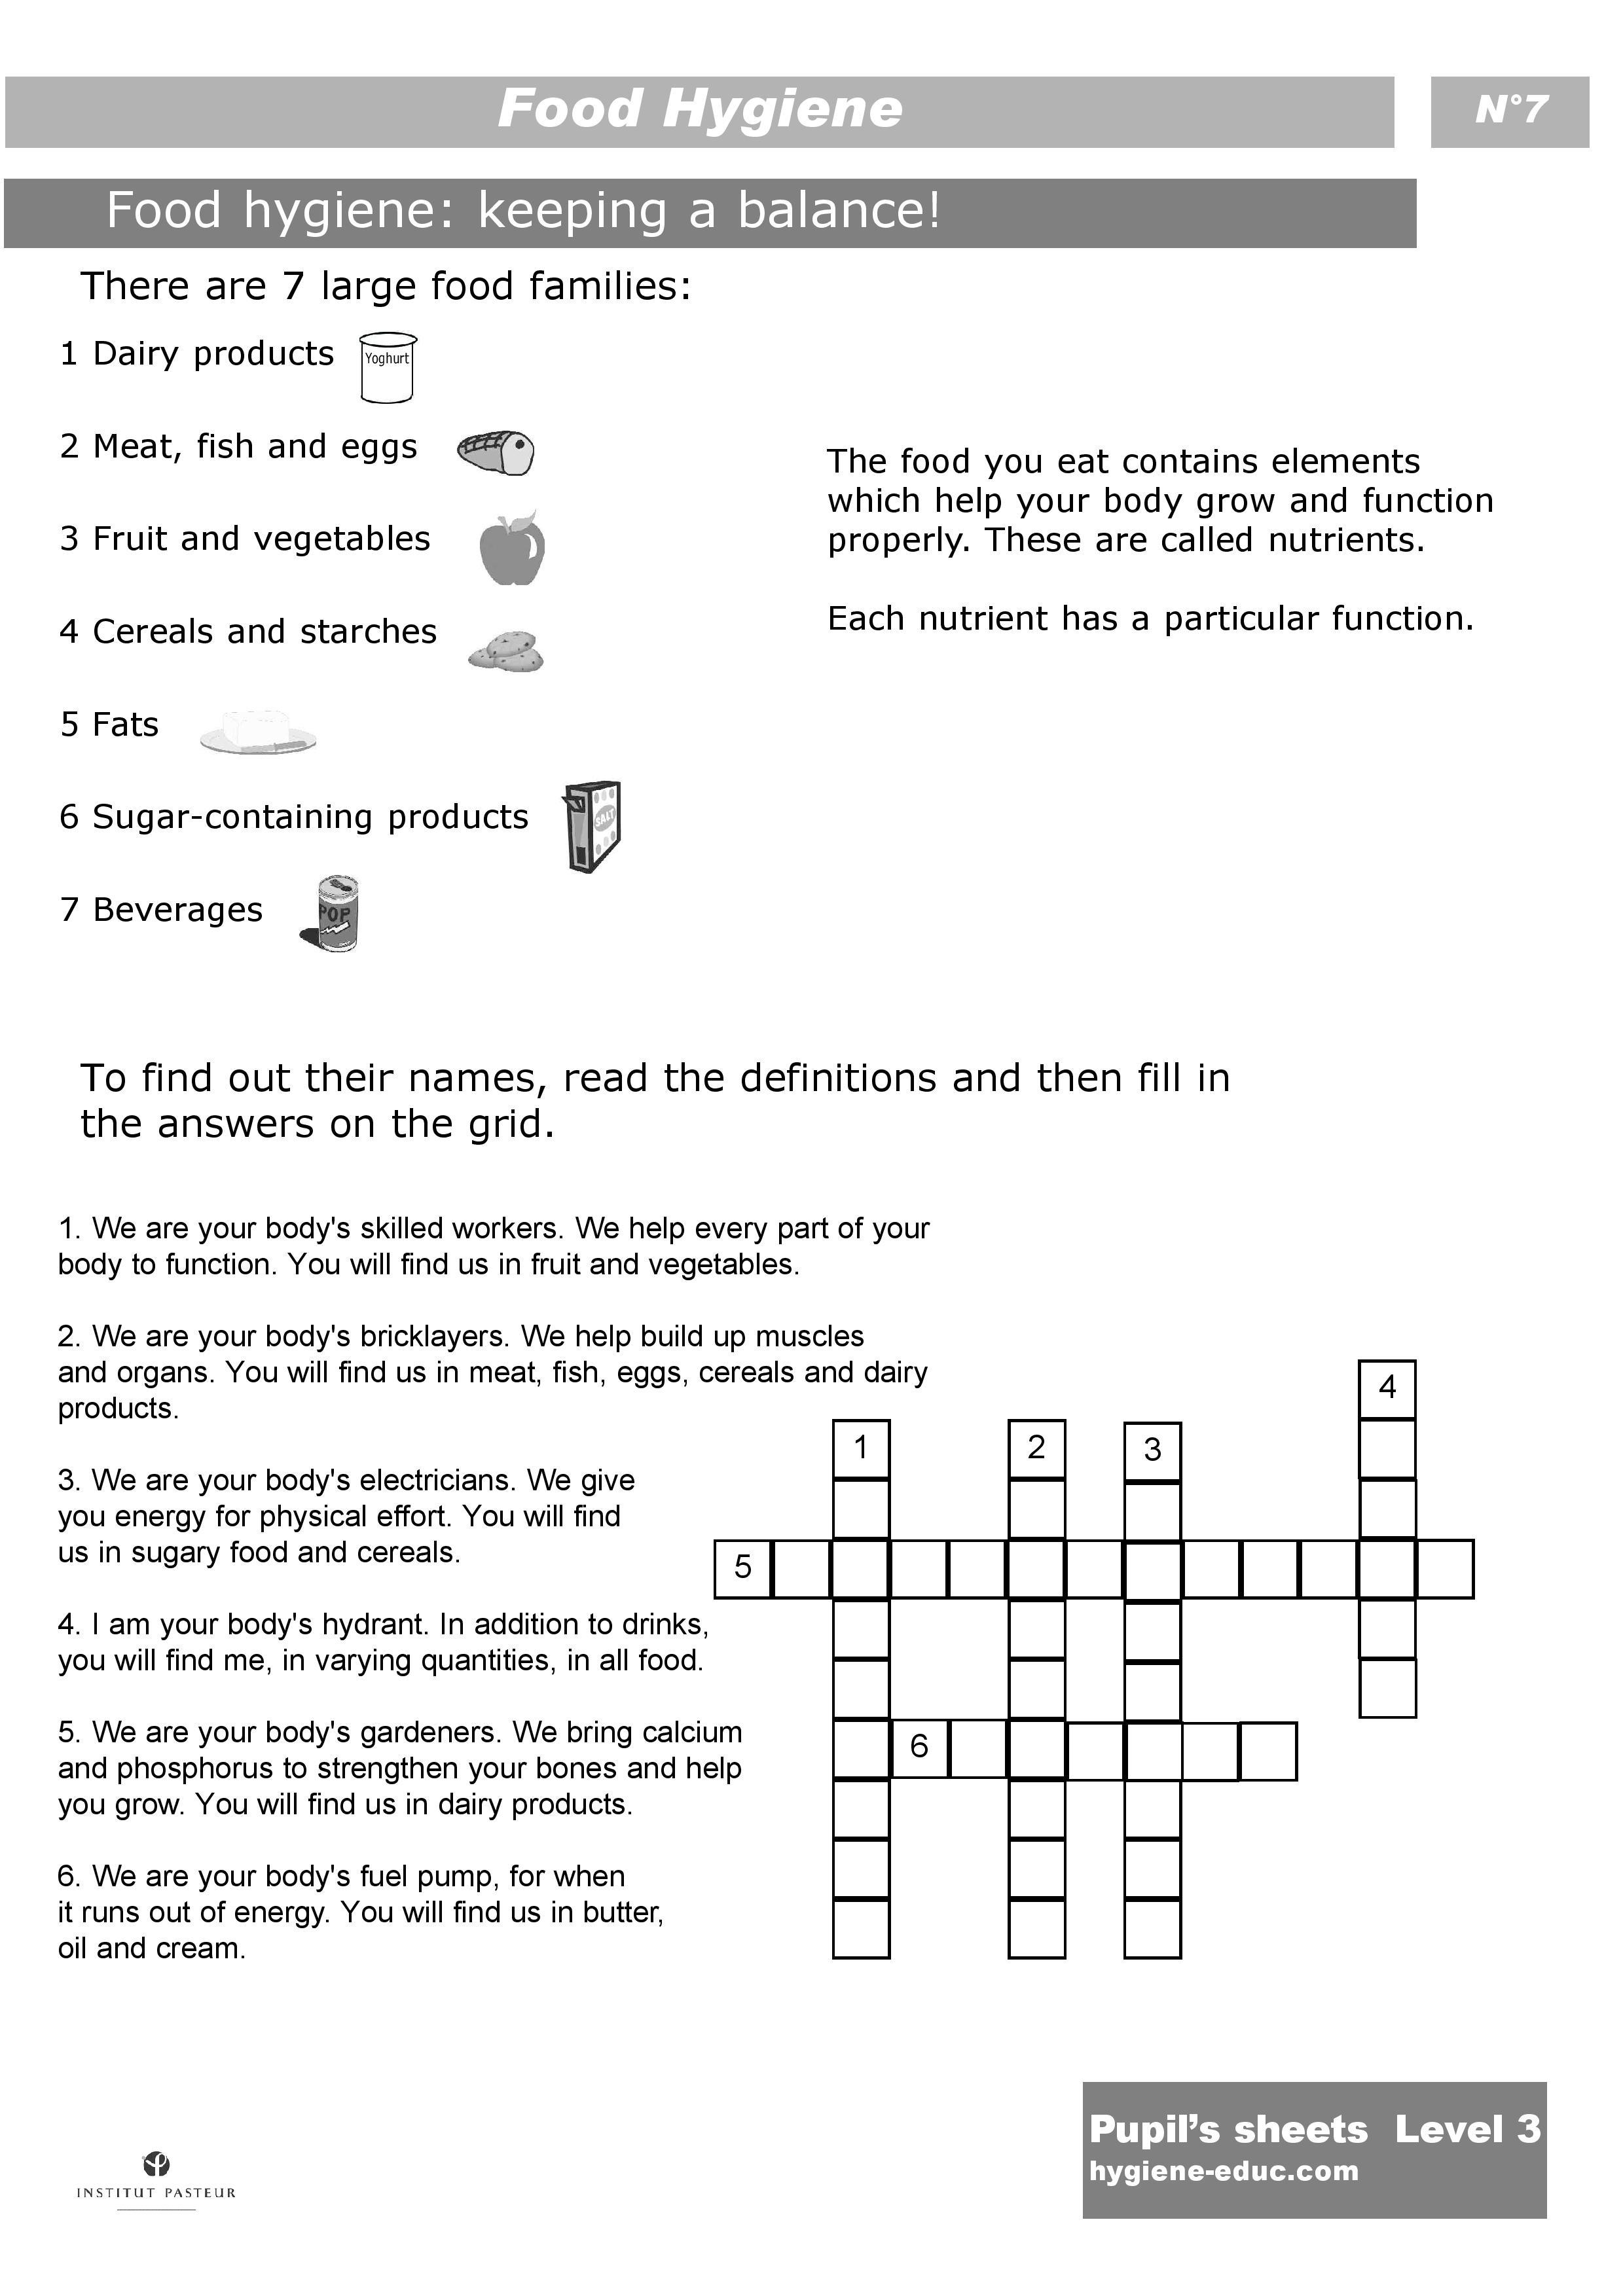 Worksheets. Hygiene Worksheets For Elementary Students. Cheatslist - Free Printable Personal Hygiene Worksheets